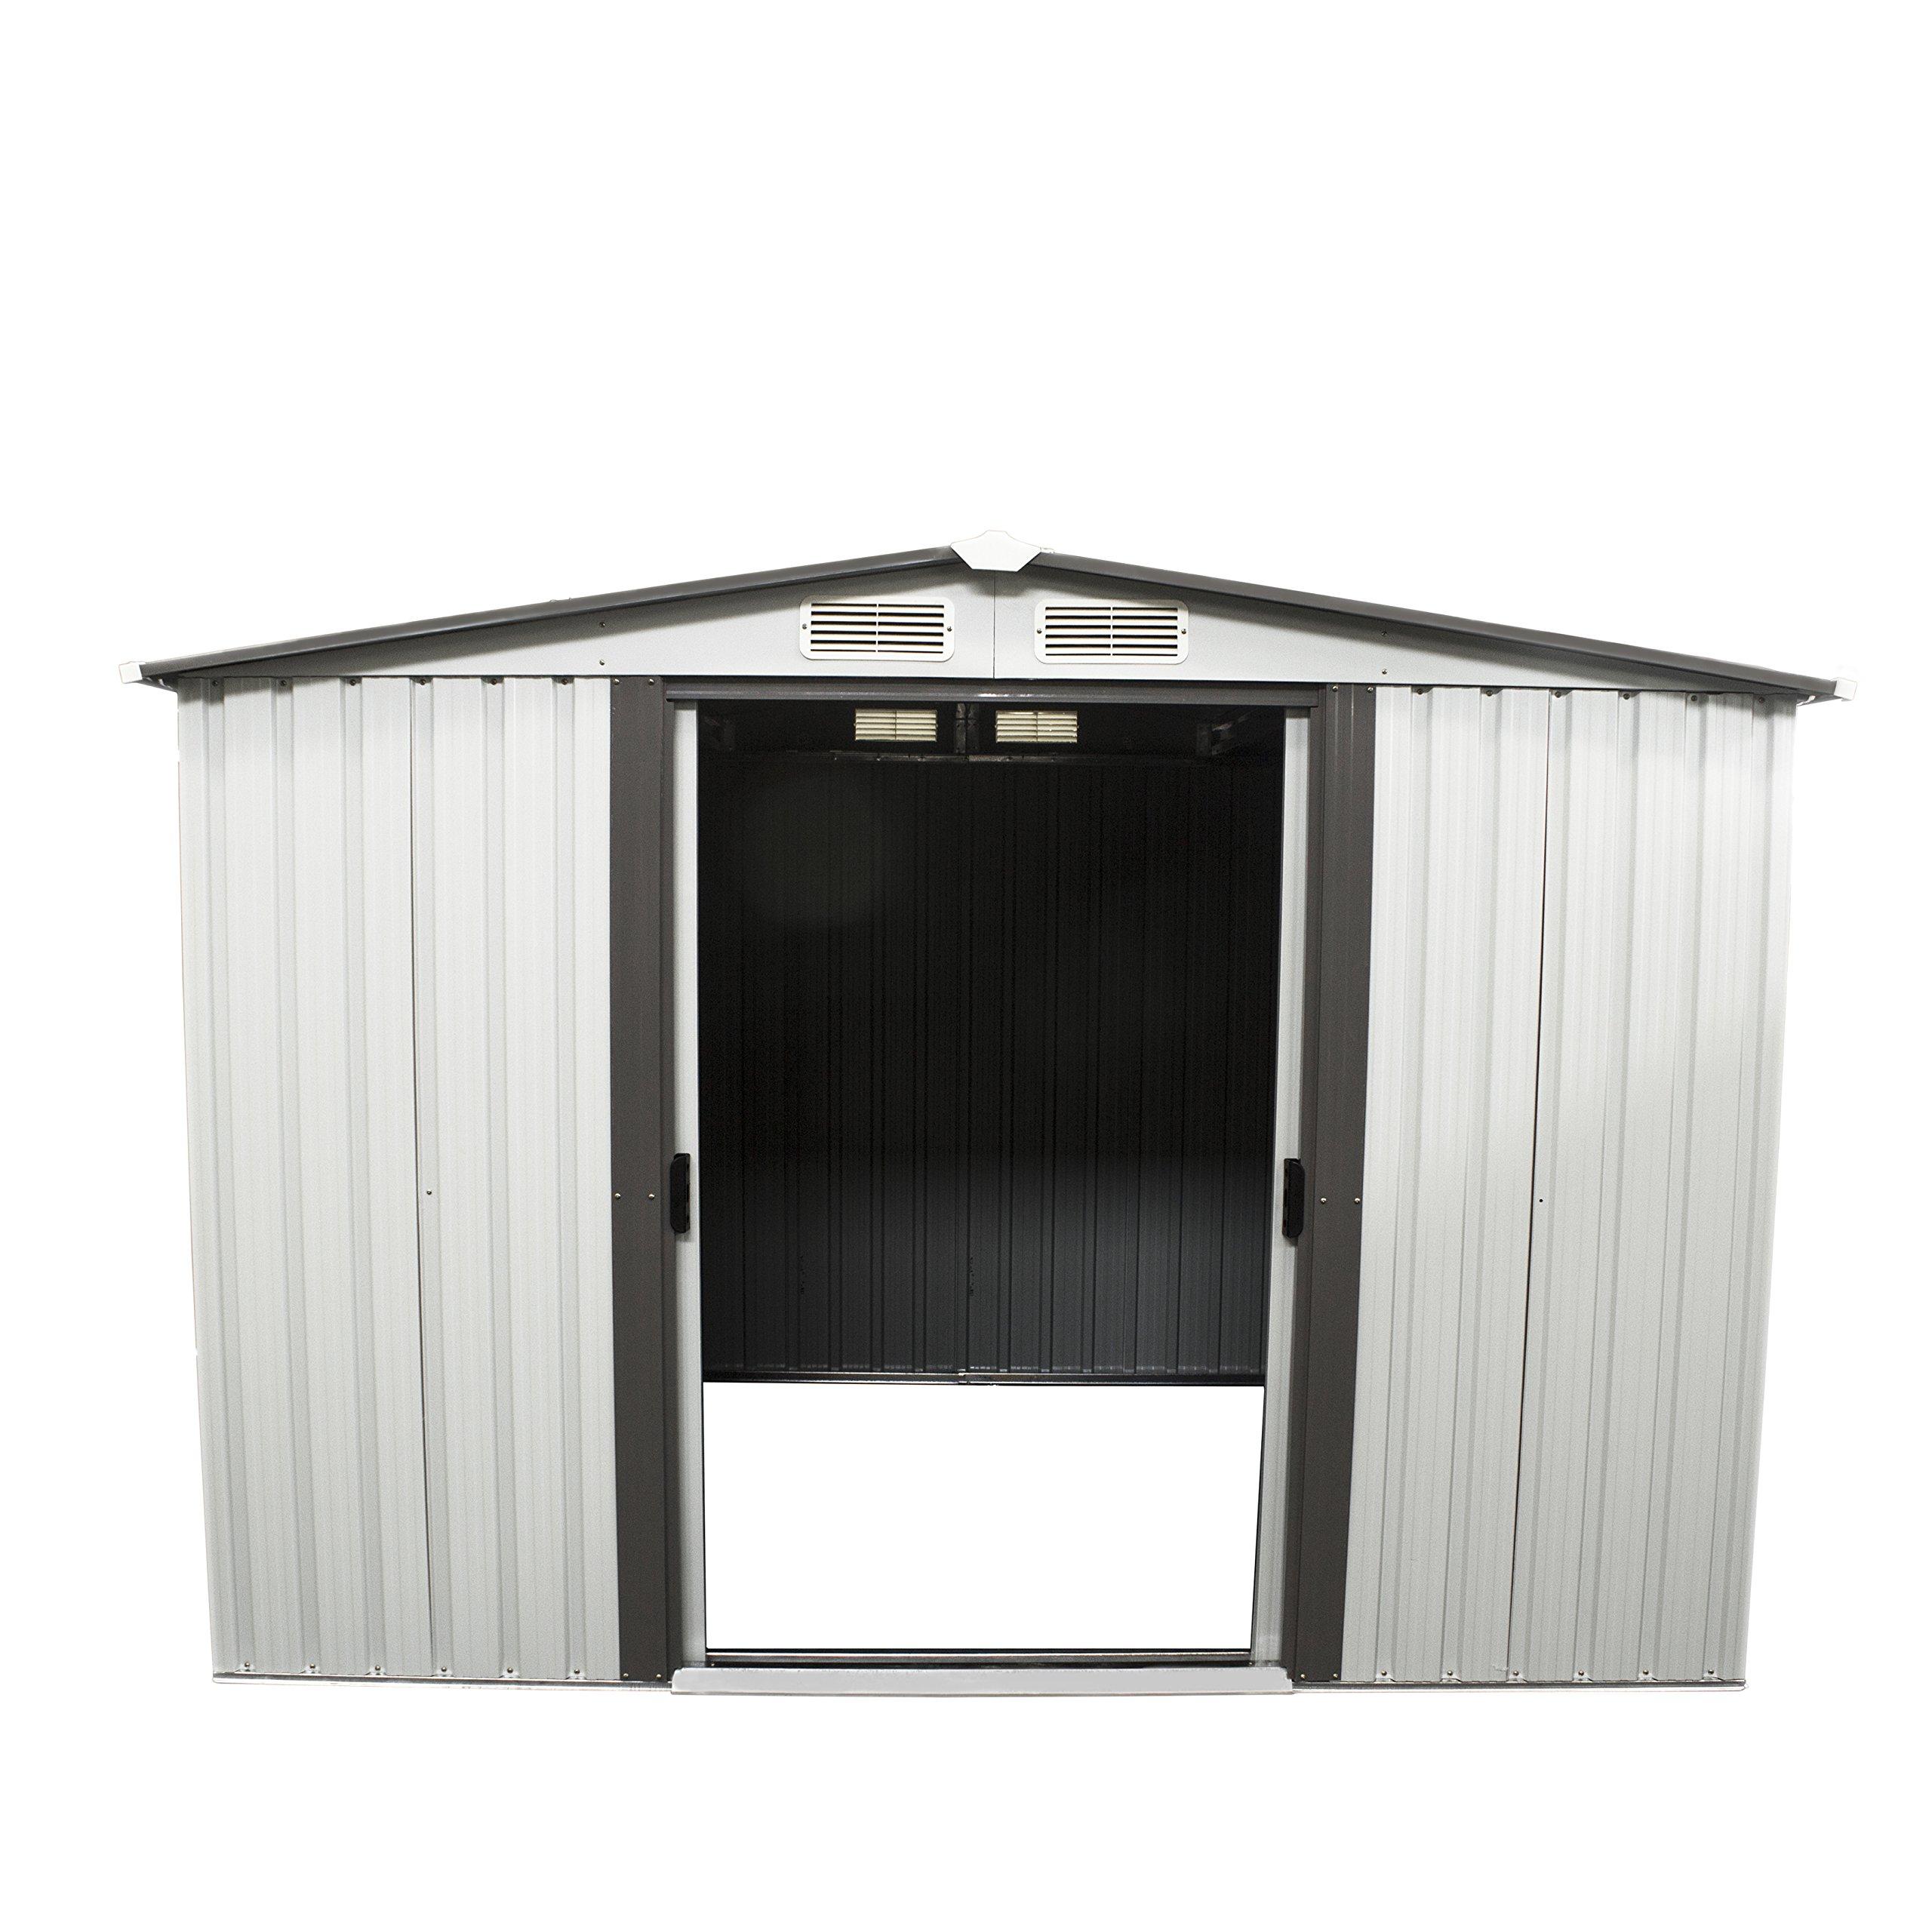 papabox 8'x6' Outdoor Storage Shed Steel Garden Utility Tool Backyard Lawn Building Garage with Doors